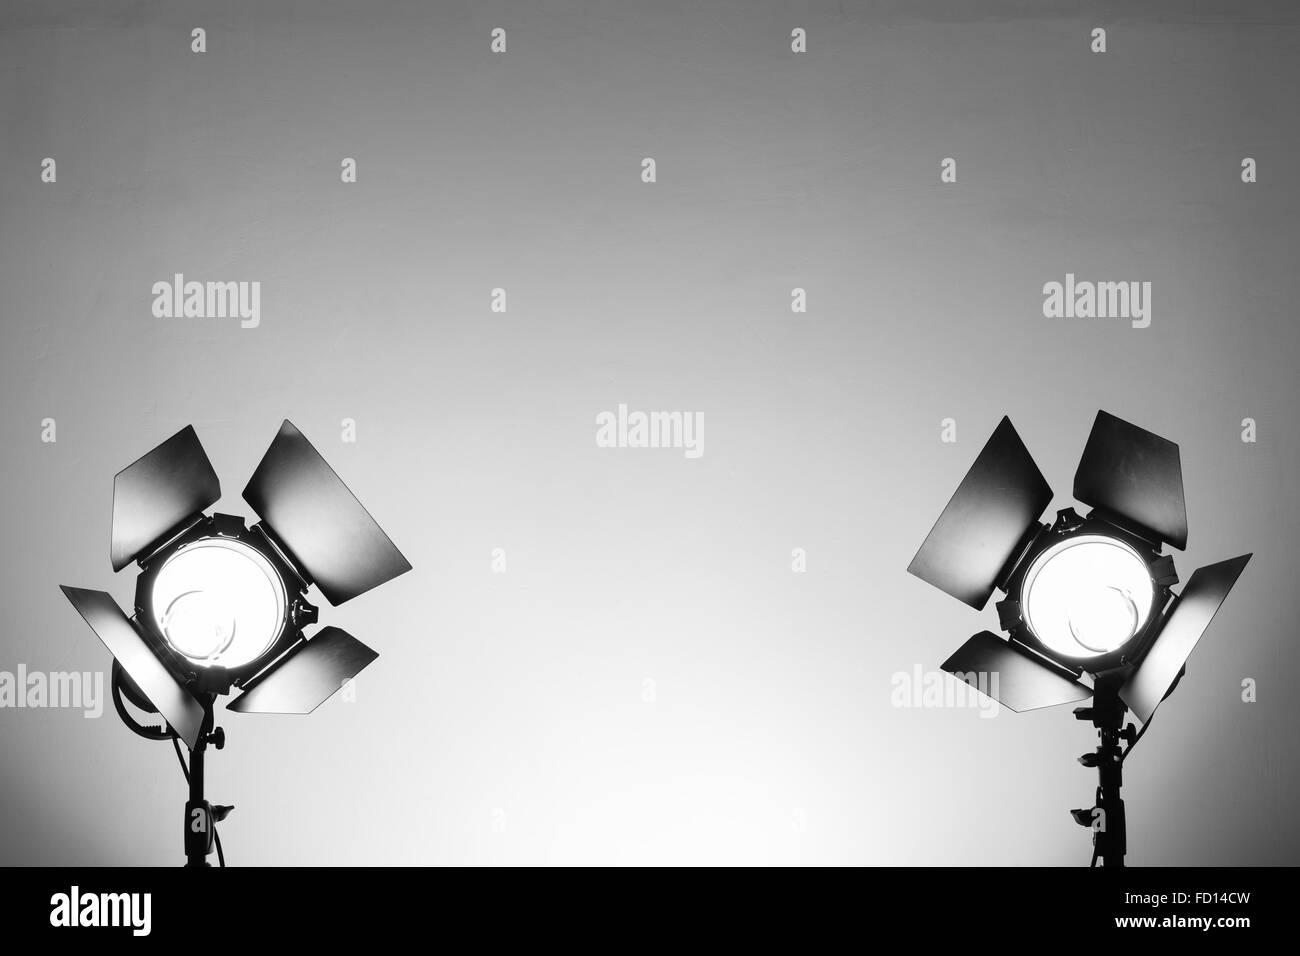 Empty photo studio with lighting equipment - Stock Image